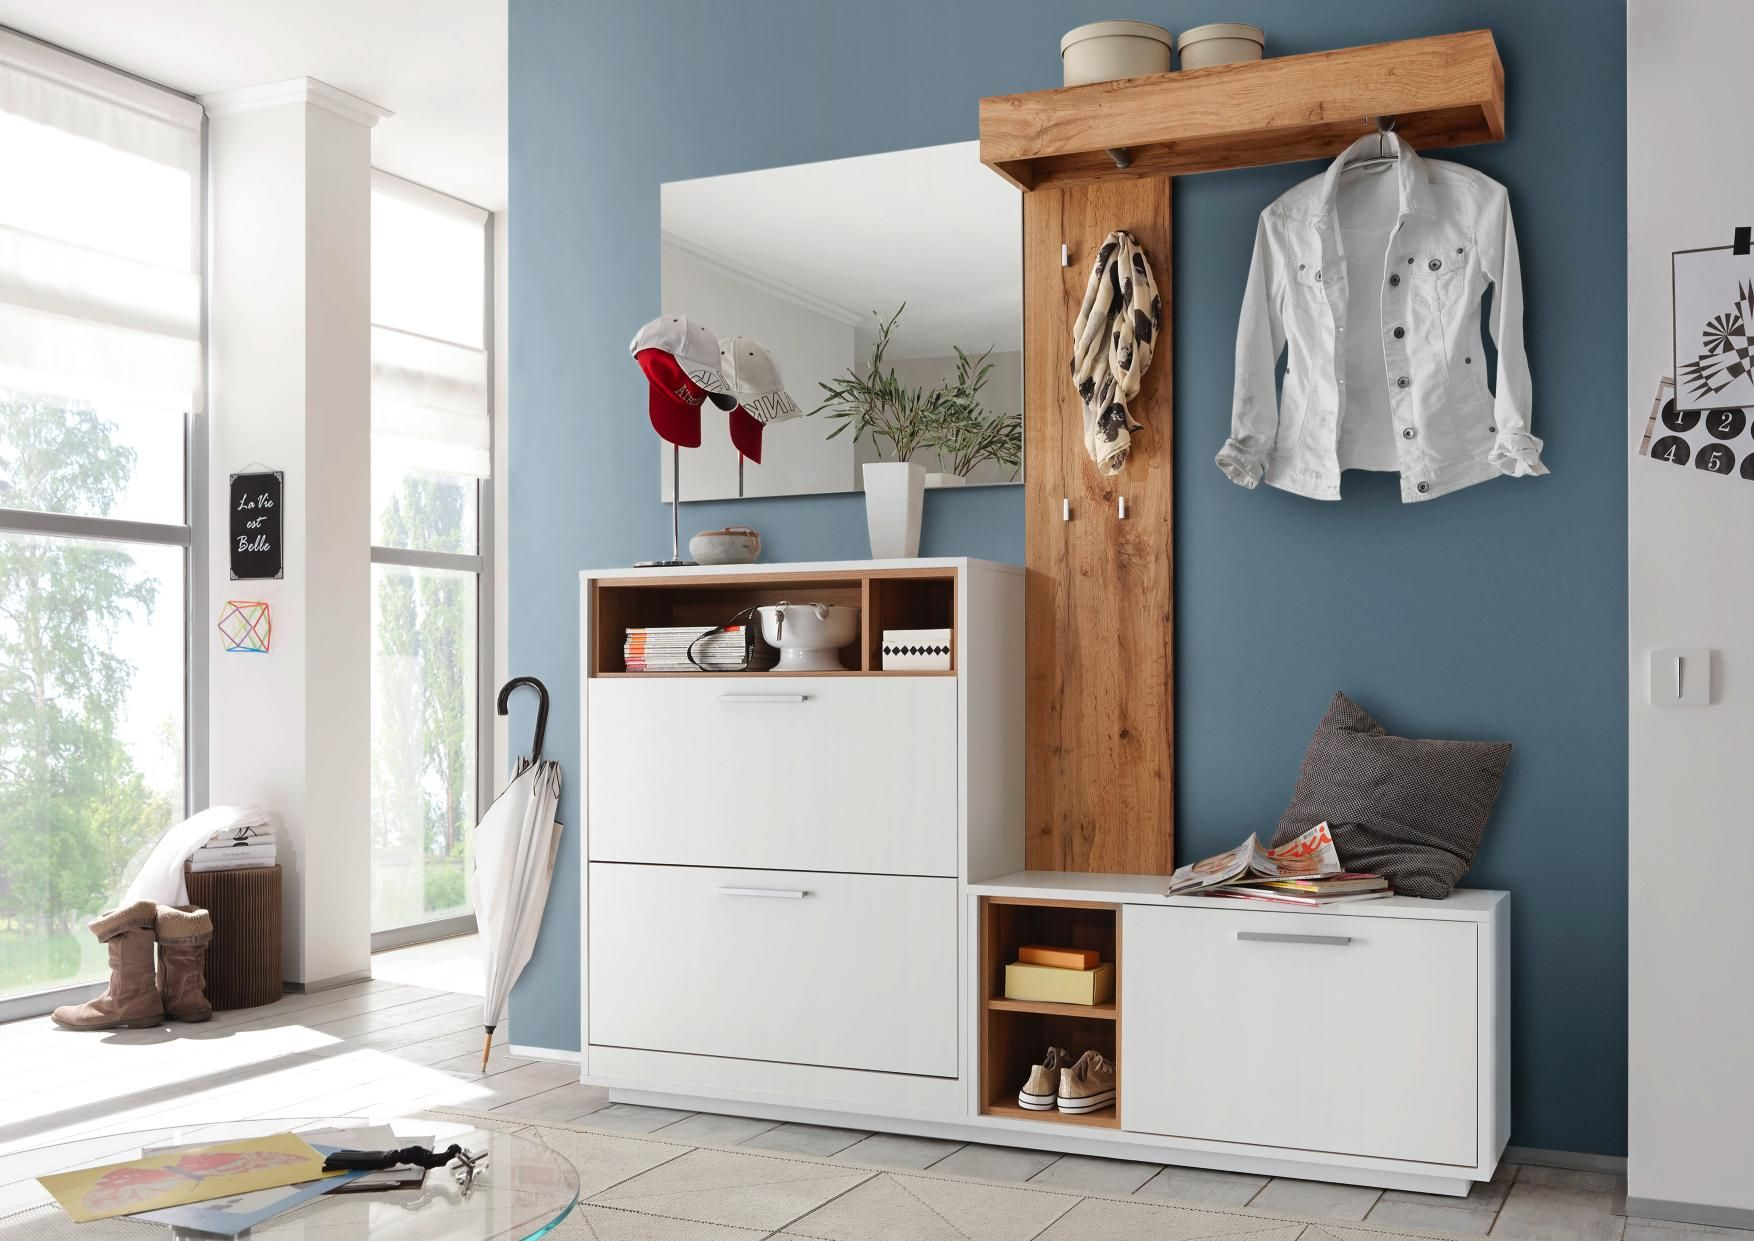 Carry Home Garderobe Garderobenset Garderoben Set